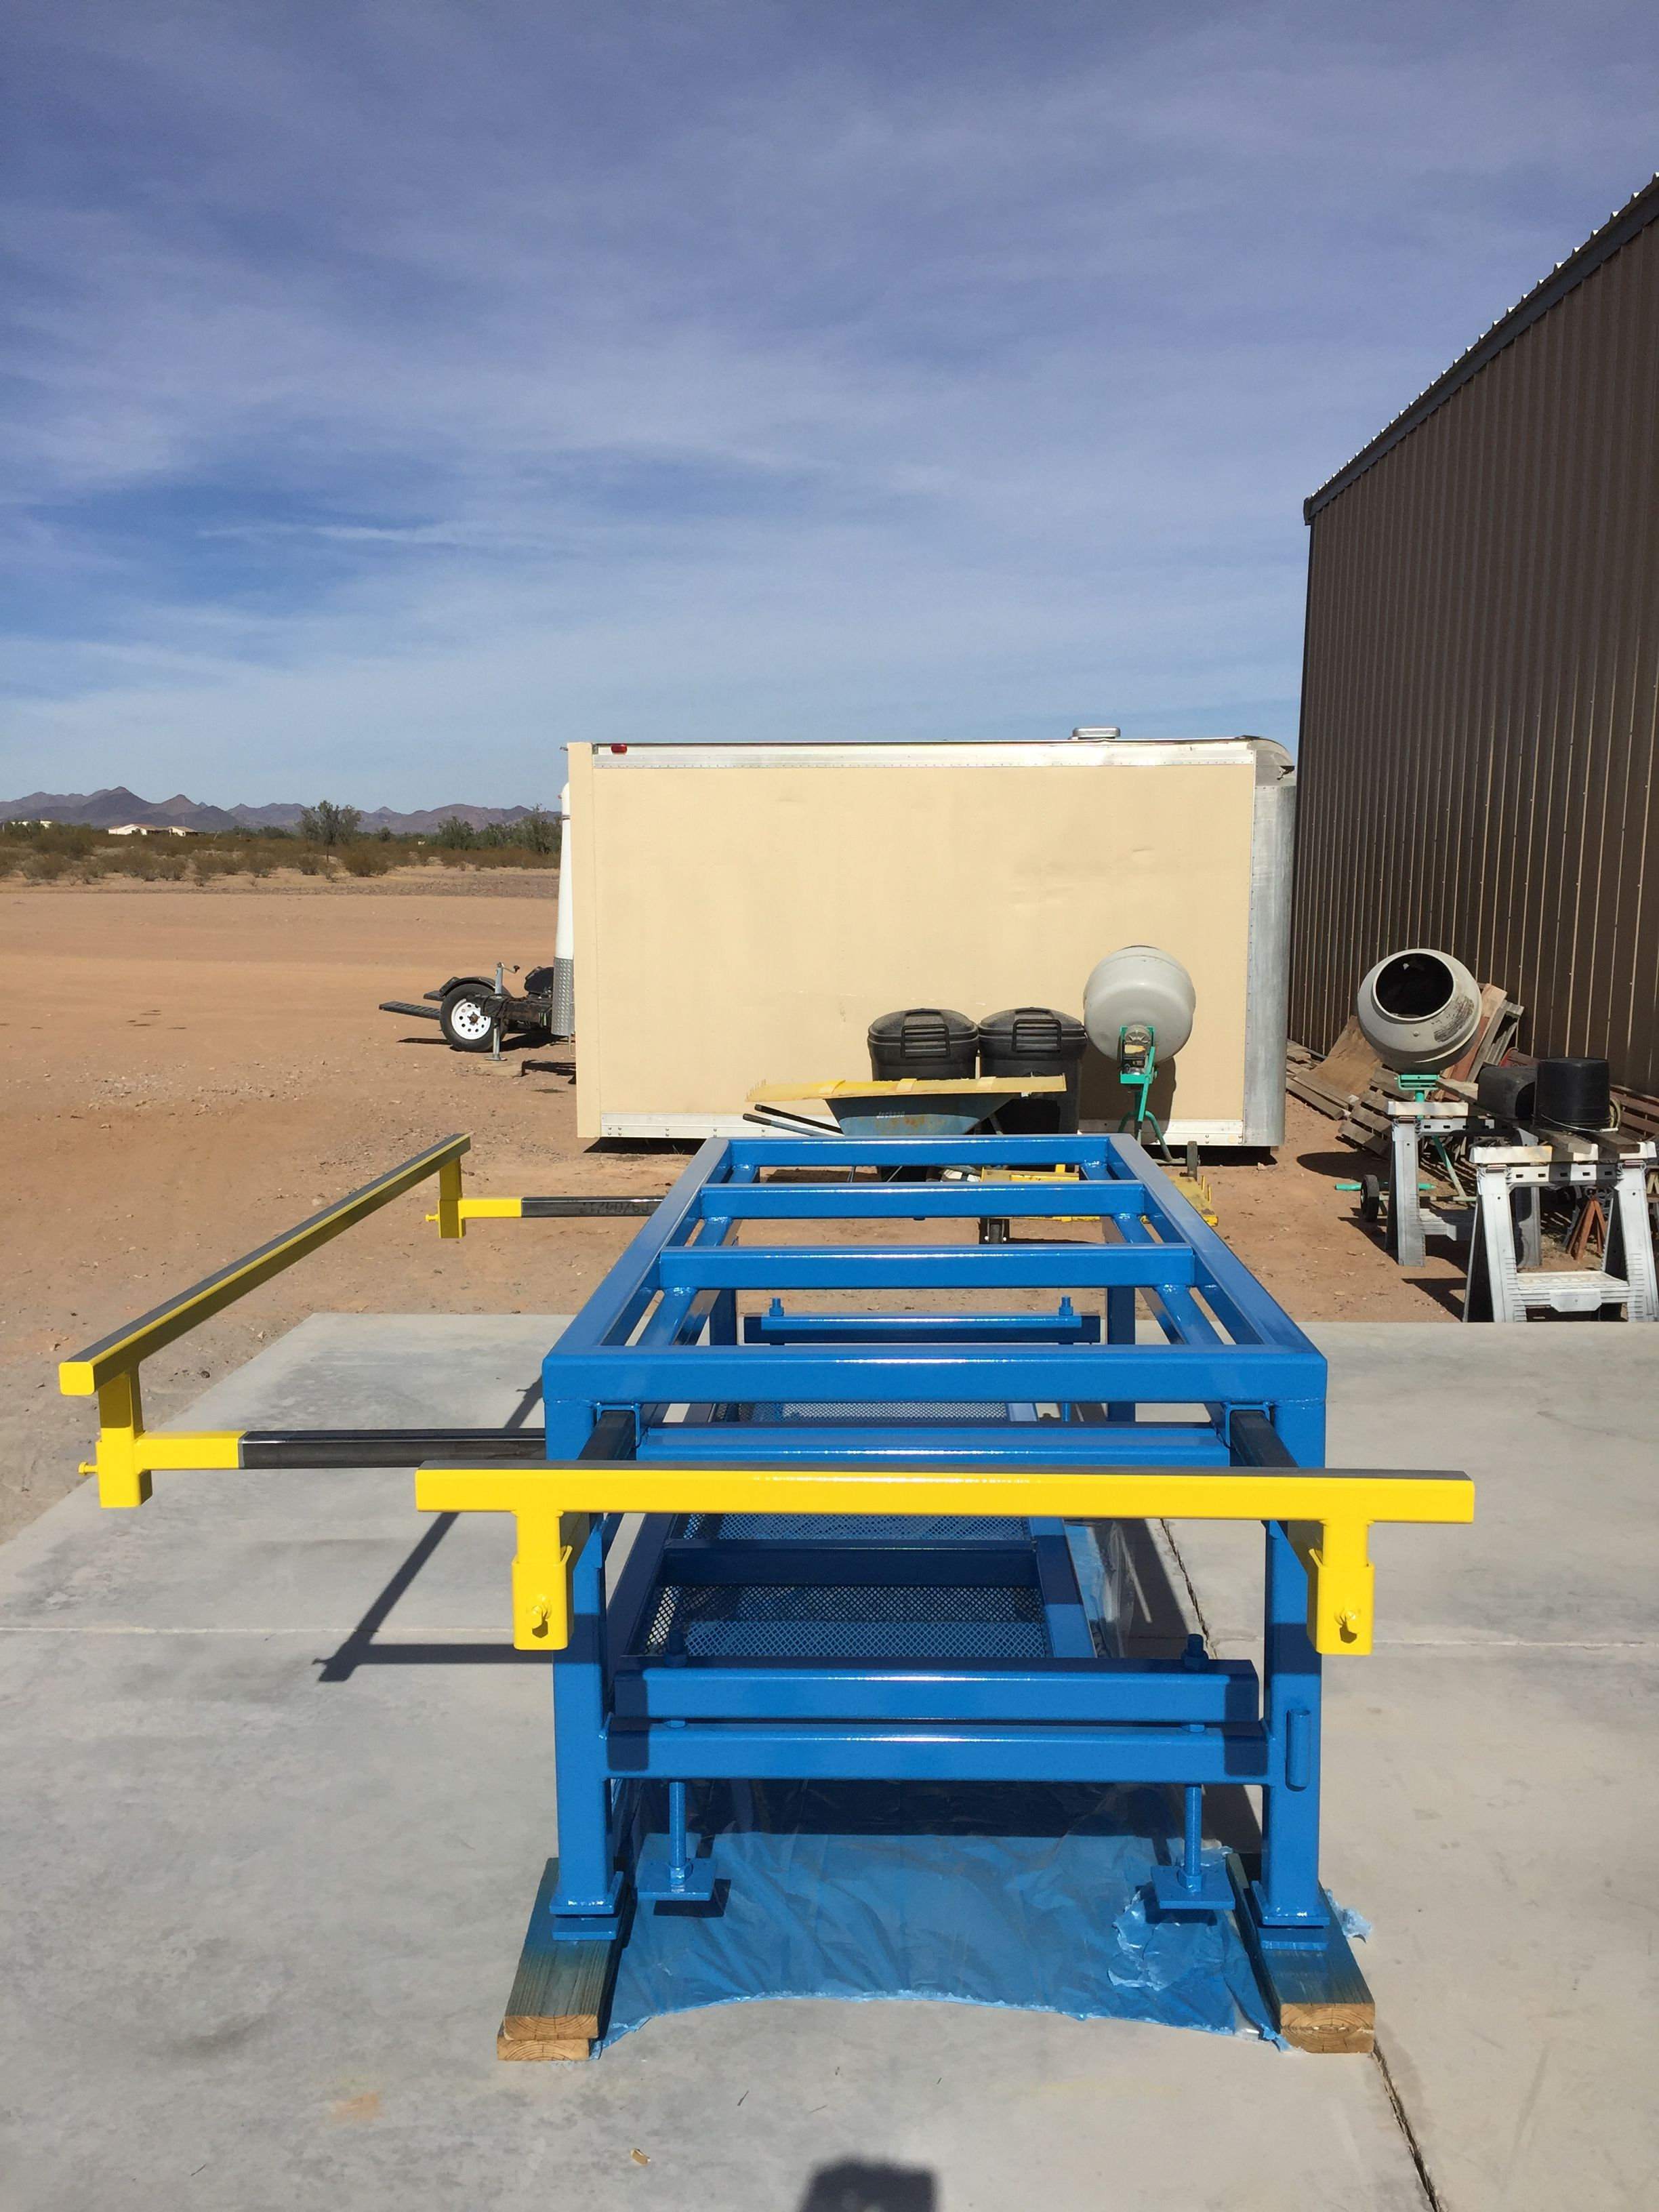 Pin By 008 On Shop Tools Welding Table Welding Cart Welding